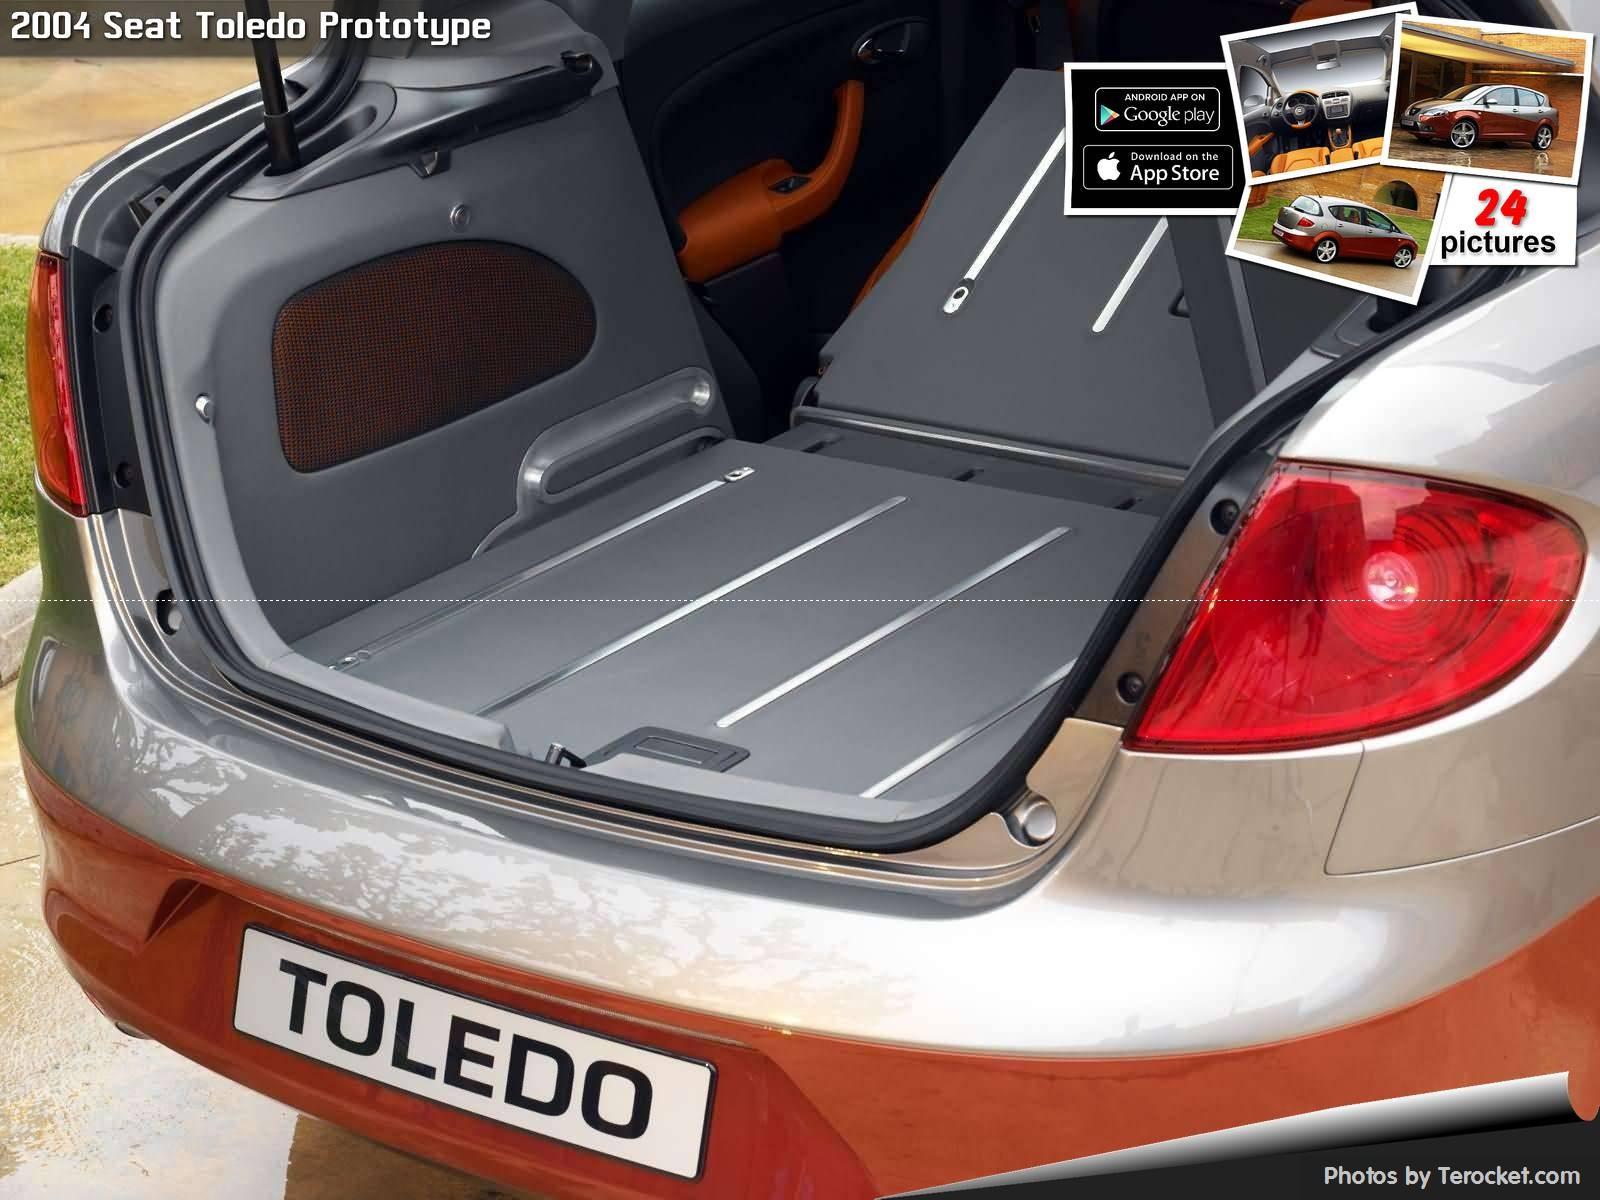 Hình ảnh xe ô tô Seat Toledo Prototype 2004 & nội ngoại thất